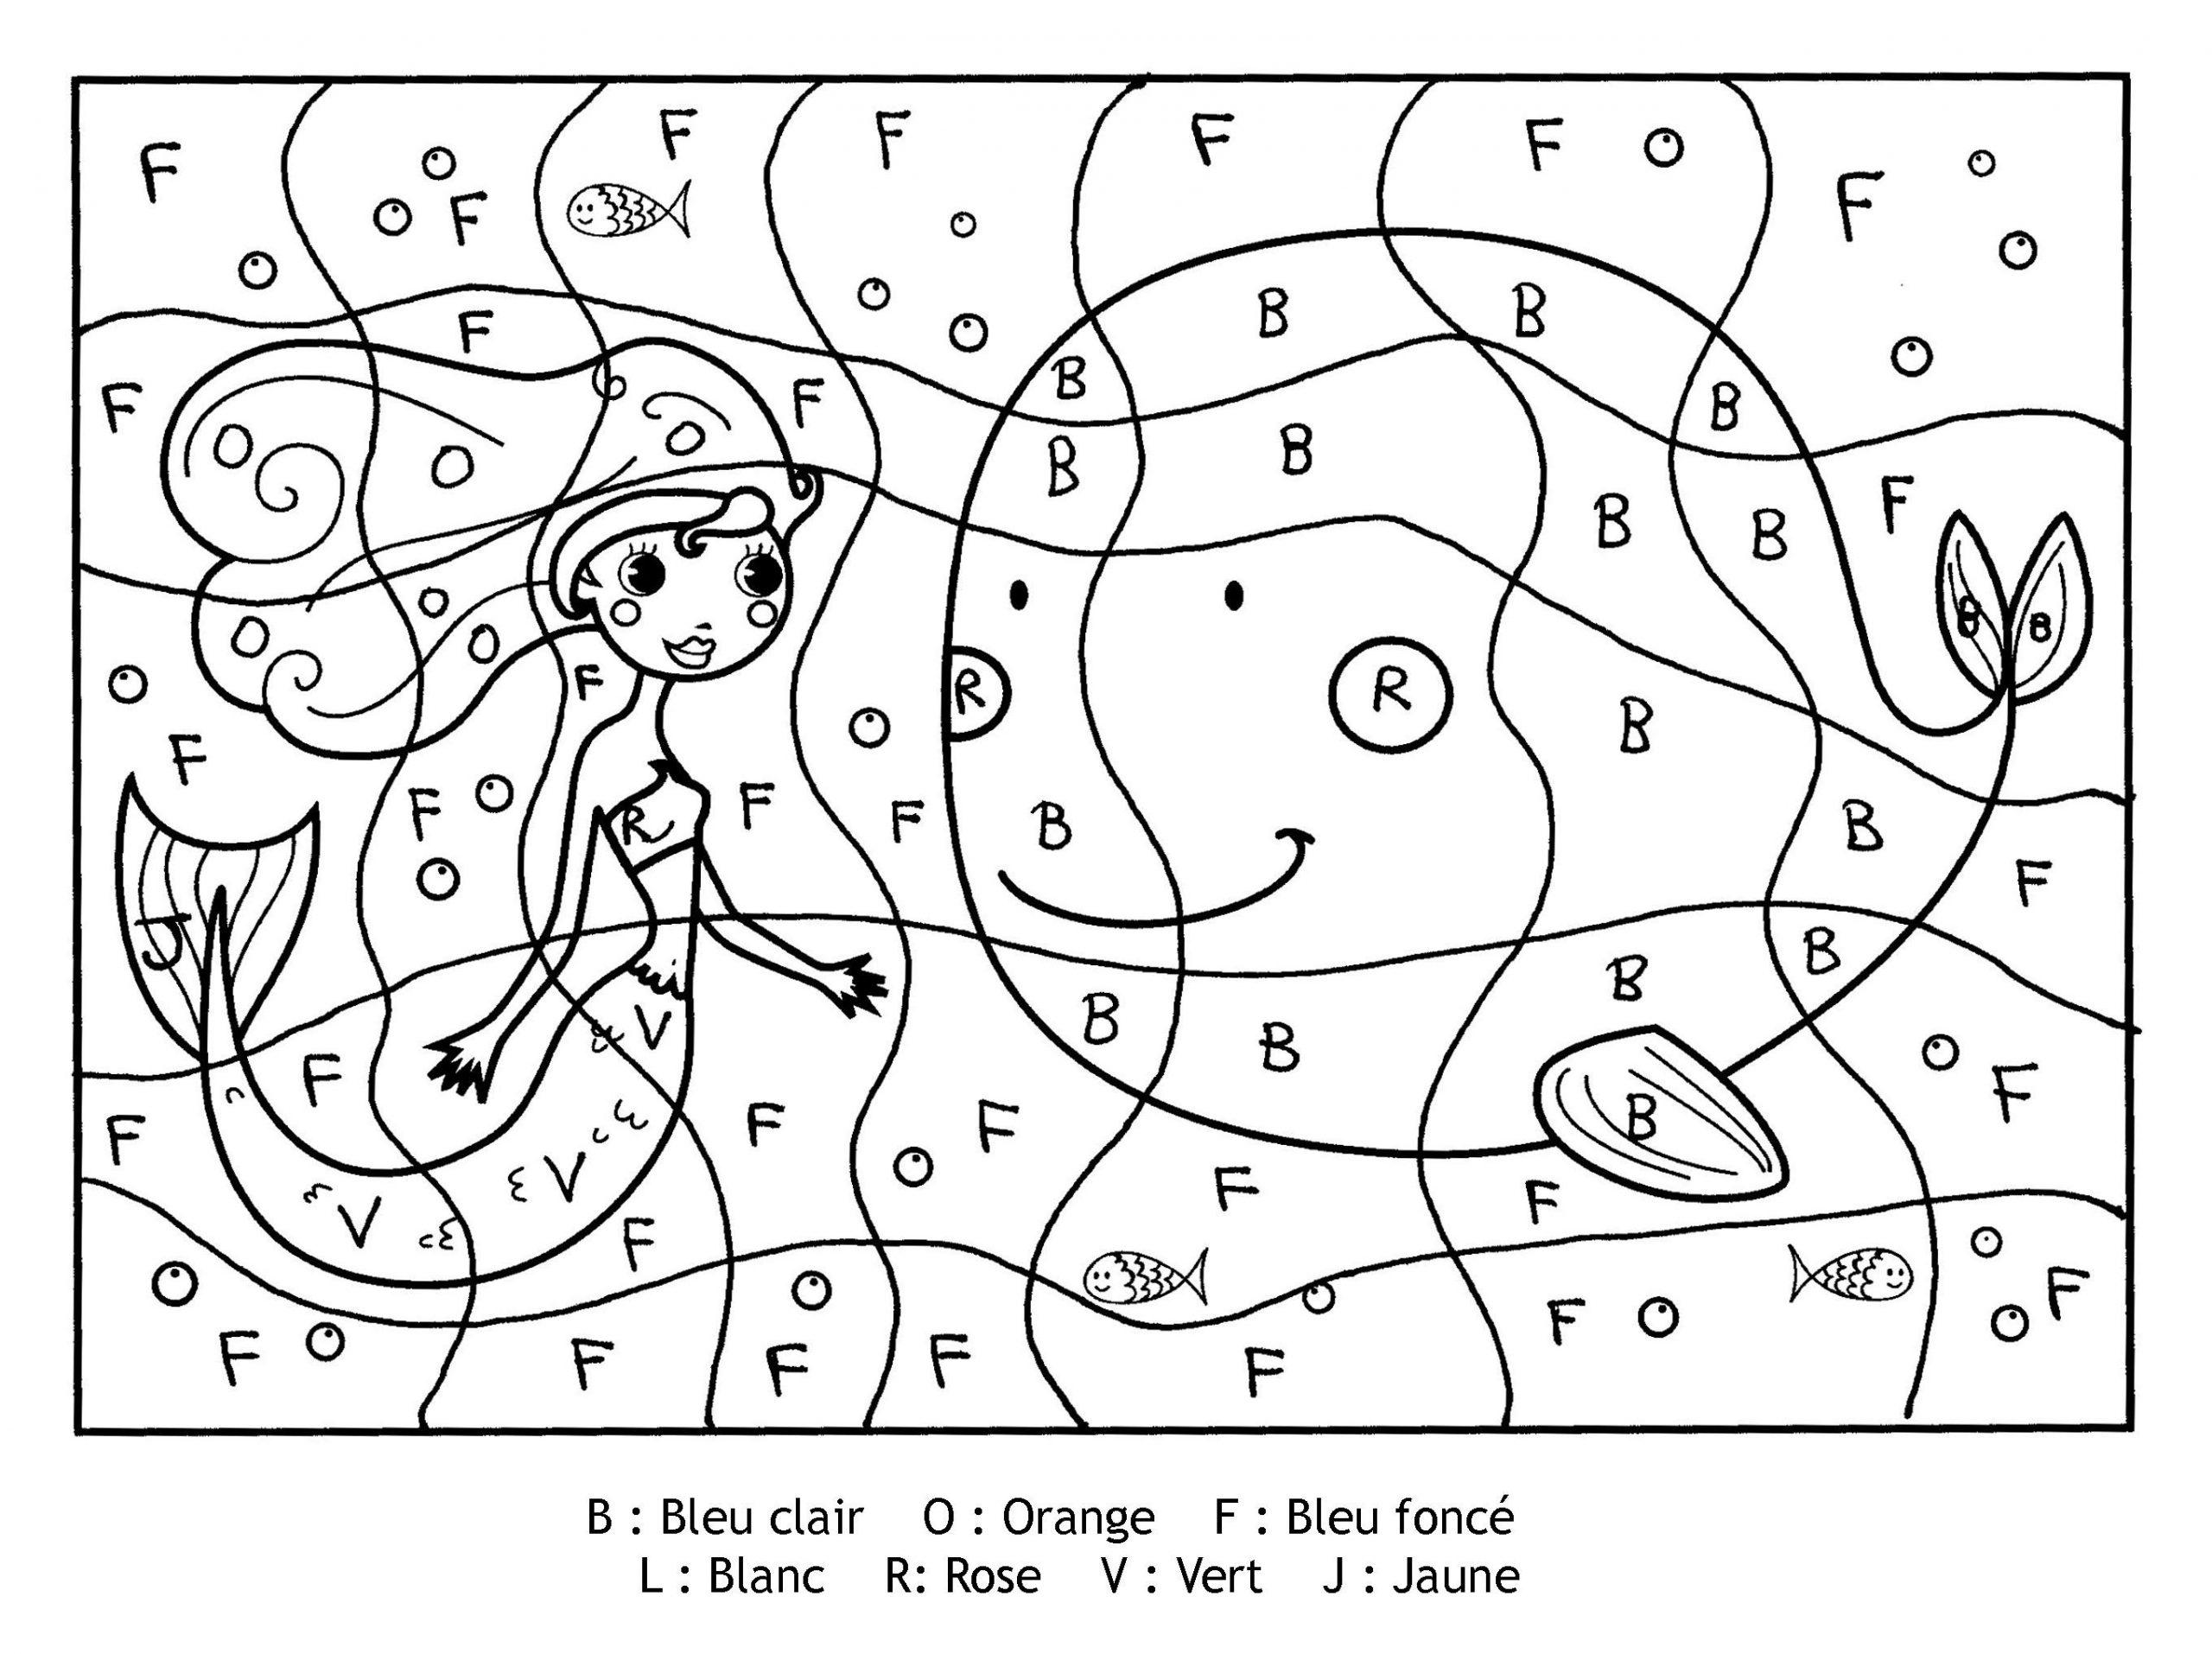 Magique Lettres Sirene - Lettres | Coloriage Magique destiné Coloriage Magique Maternelle Grande Section